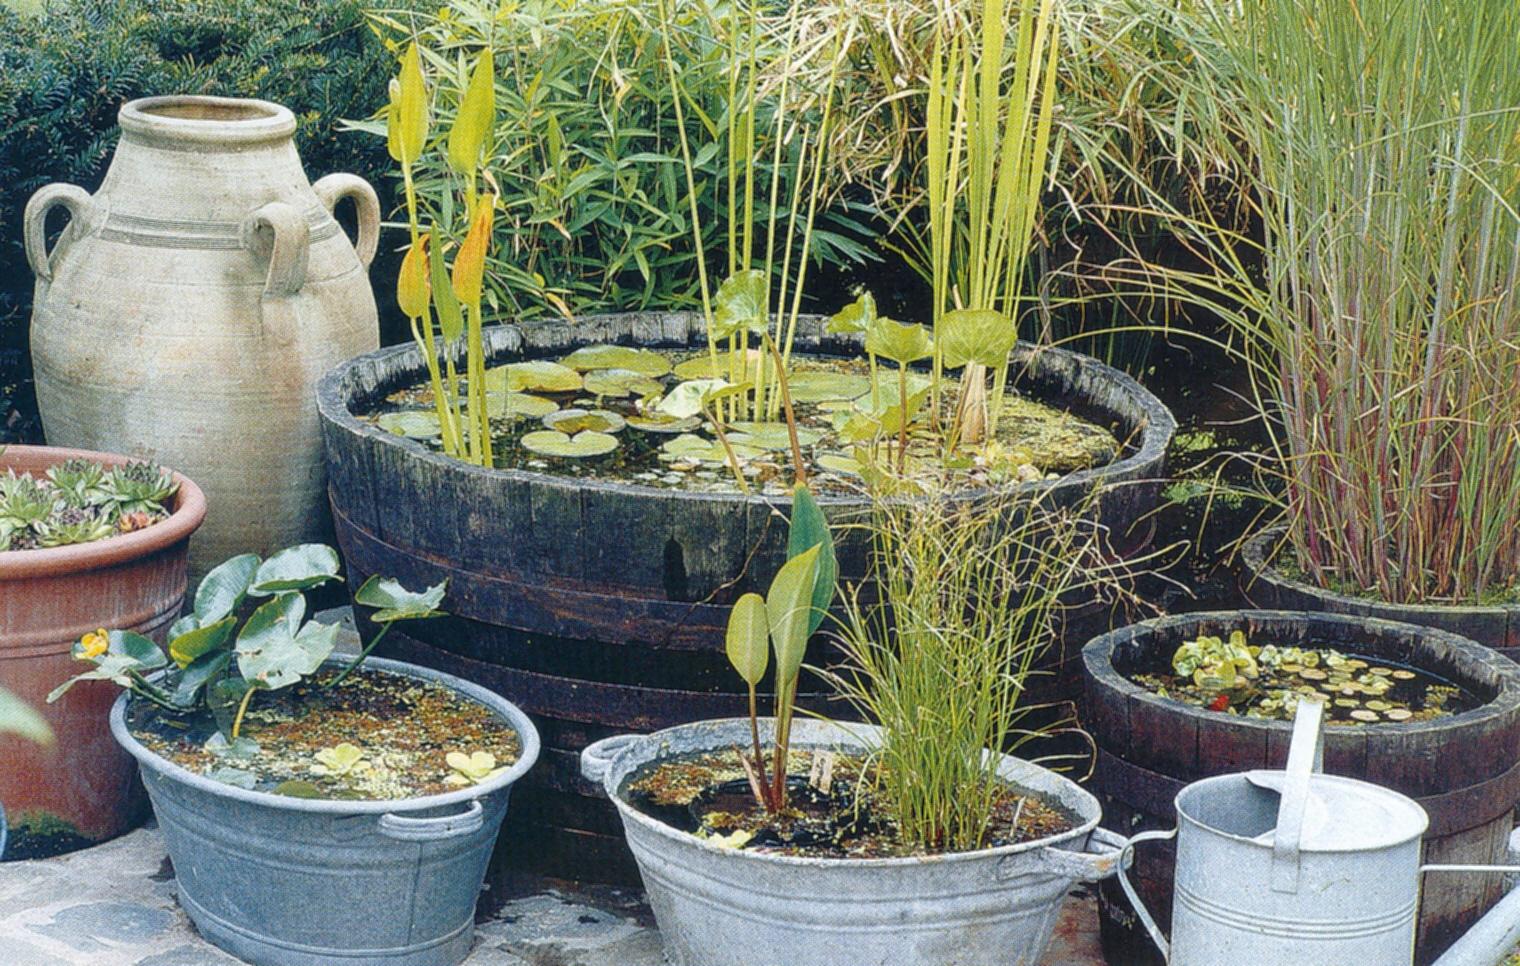 Belevenissen van een tuinkabouter siertuin kleine vijvers for Kleine tuinvijver